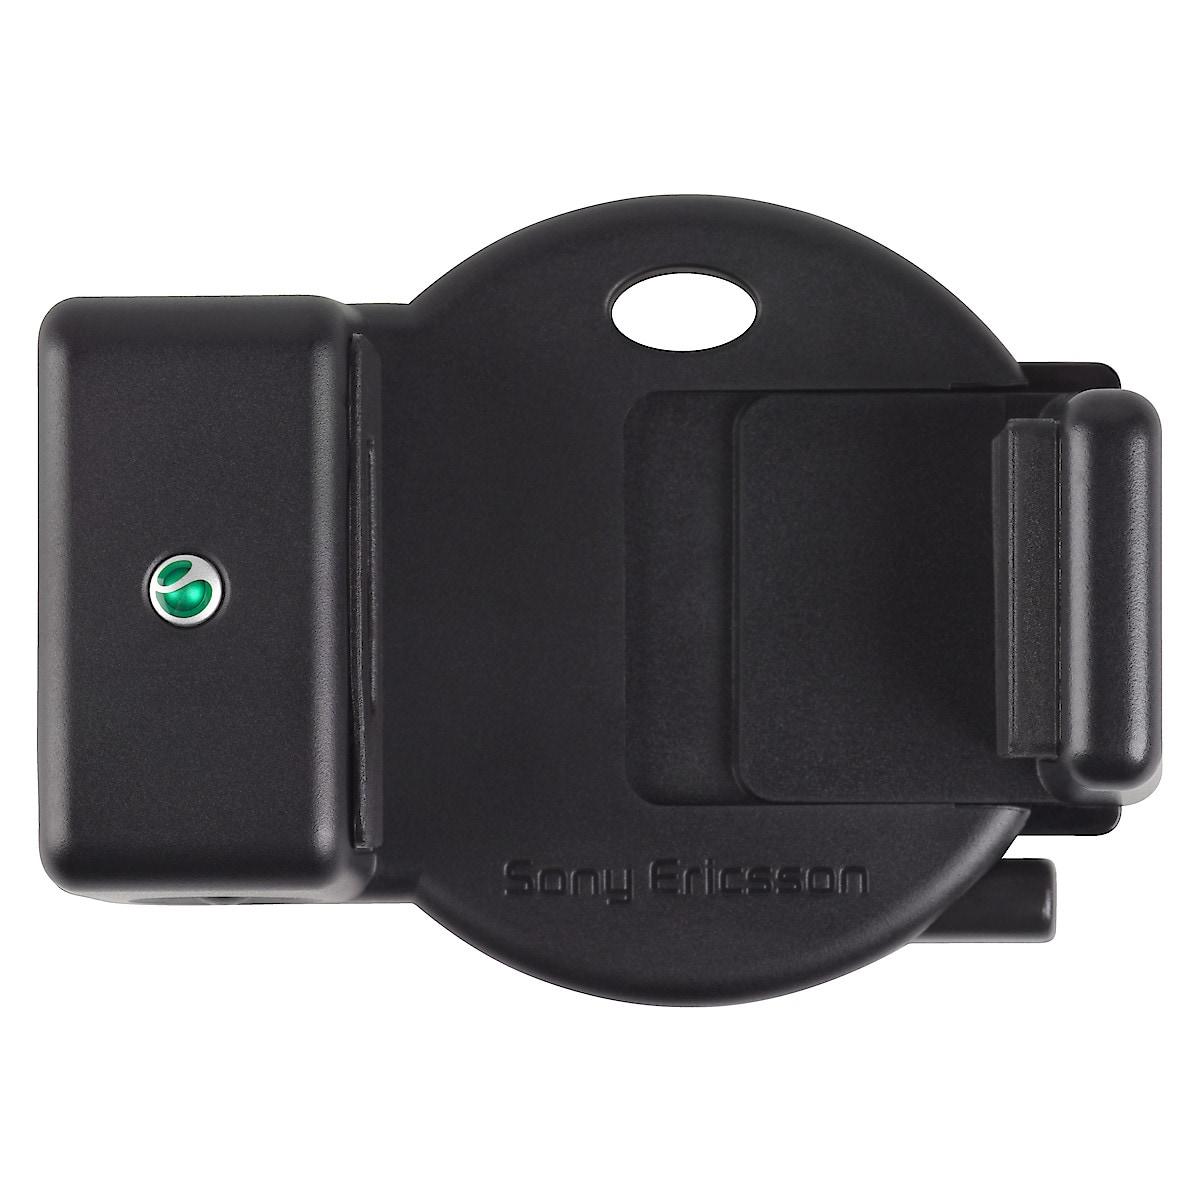 Sony Ericsson Universal Telephone Holder